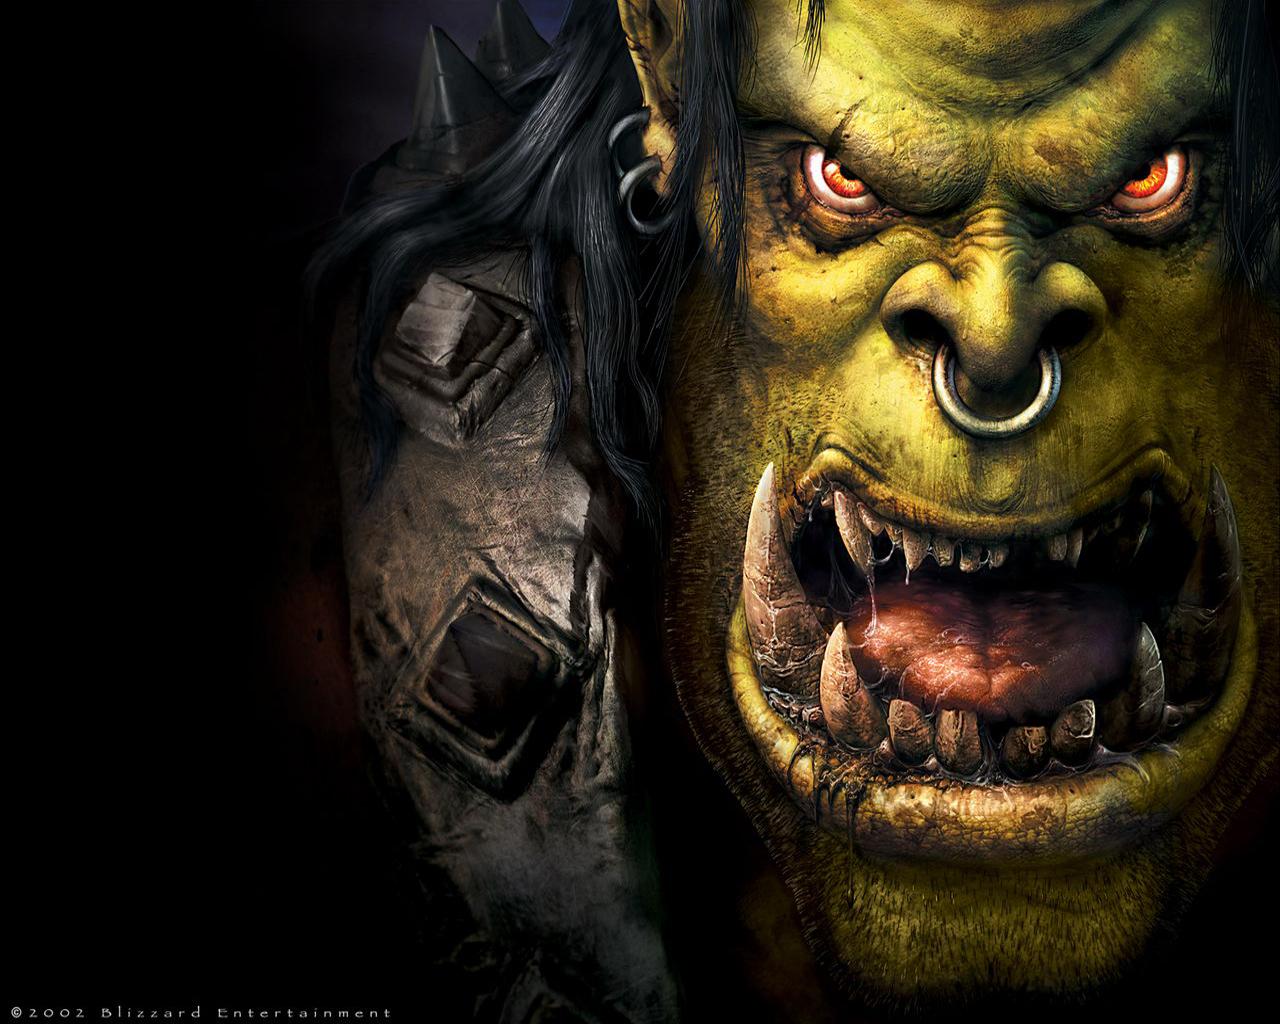 Orc Warrior Wallpaper Orc Warrior Desktop Background 1280x1024